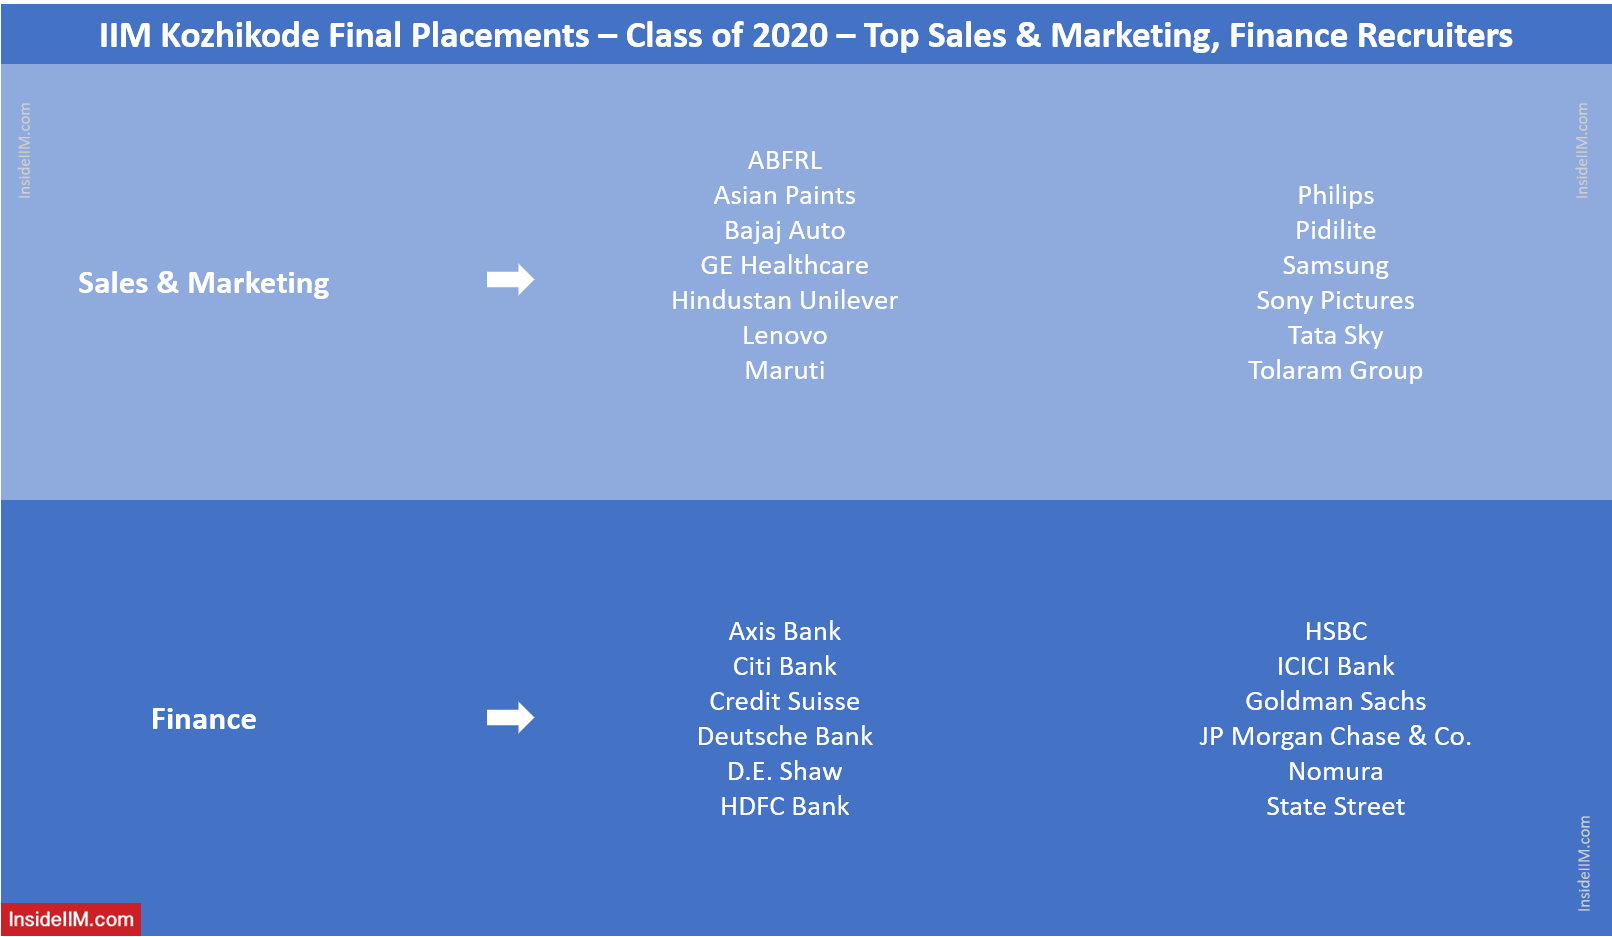 IIM Kozhikode Final Placements 2020 - Top Sales & Marketing, Finance Recruiters